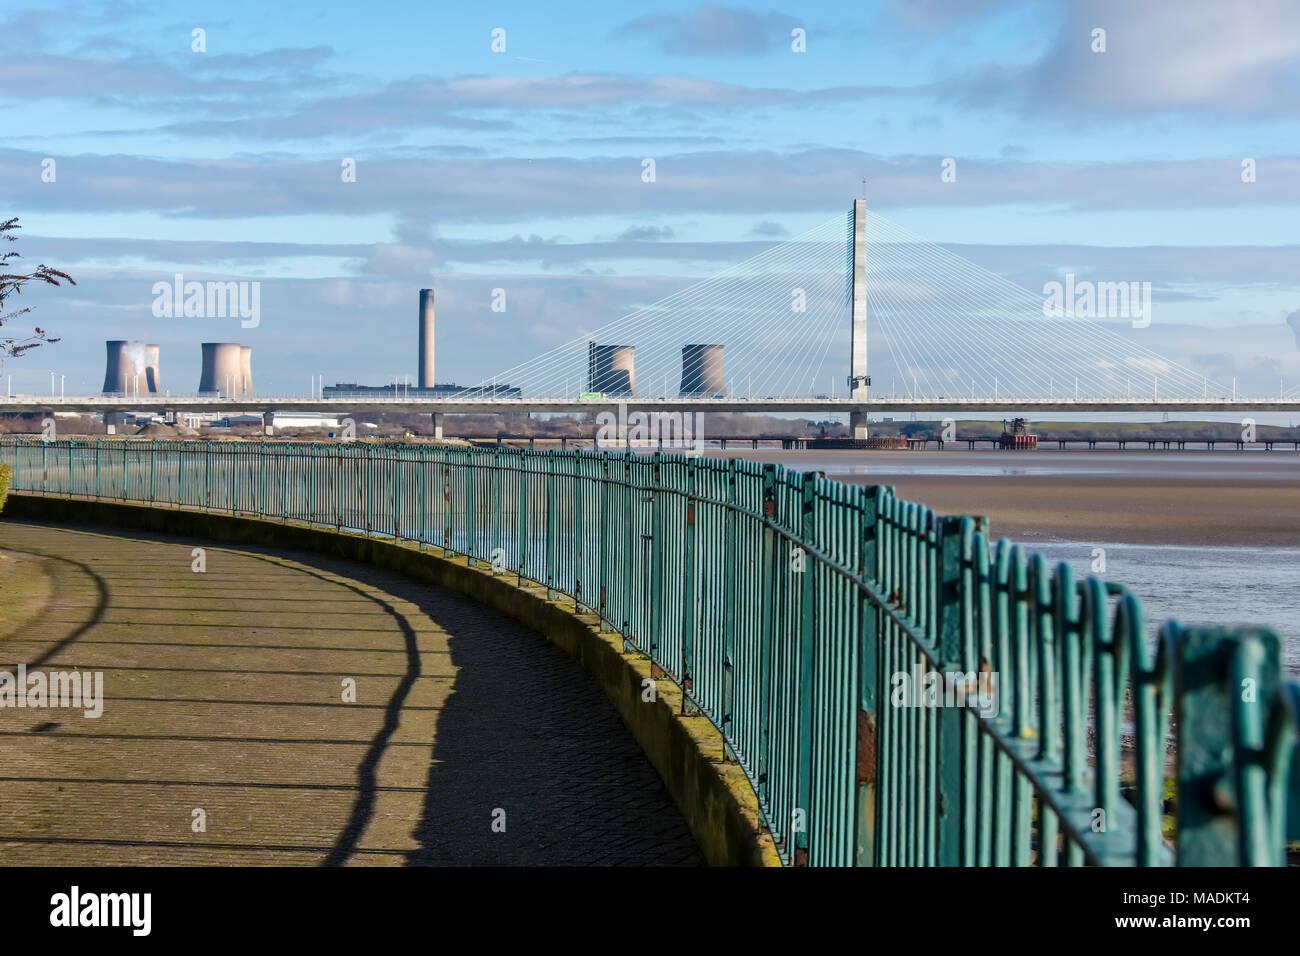 New Runcorn road bridge over the river Mersey. The Mersey Gateway - Stock Image